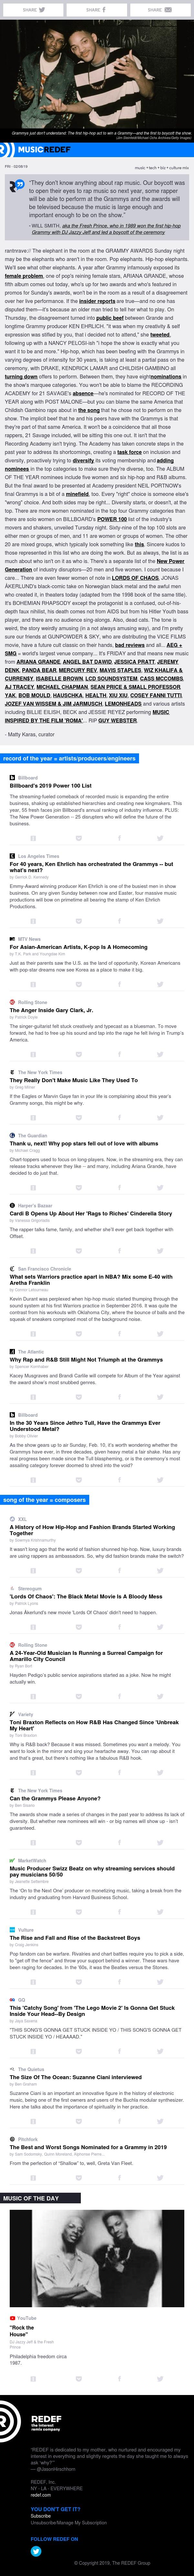 jason hirschhorn's @MusicREDEF: 02/08/2019 - Yo Grammys: Thank U Next, Billboard Power 100, K-Pop Homecoming, Gary Clark Jr., 'Lords of Chaos'...